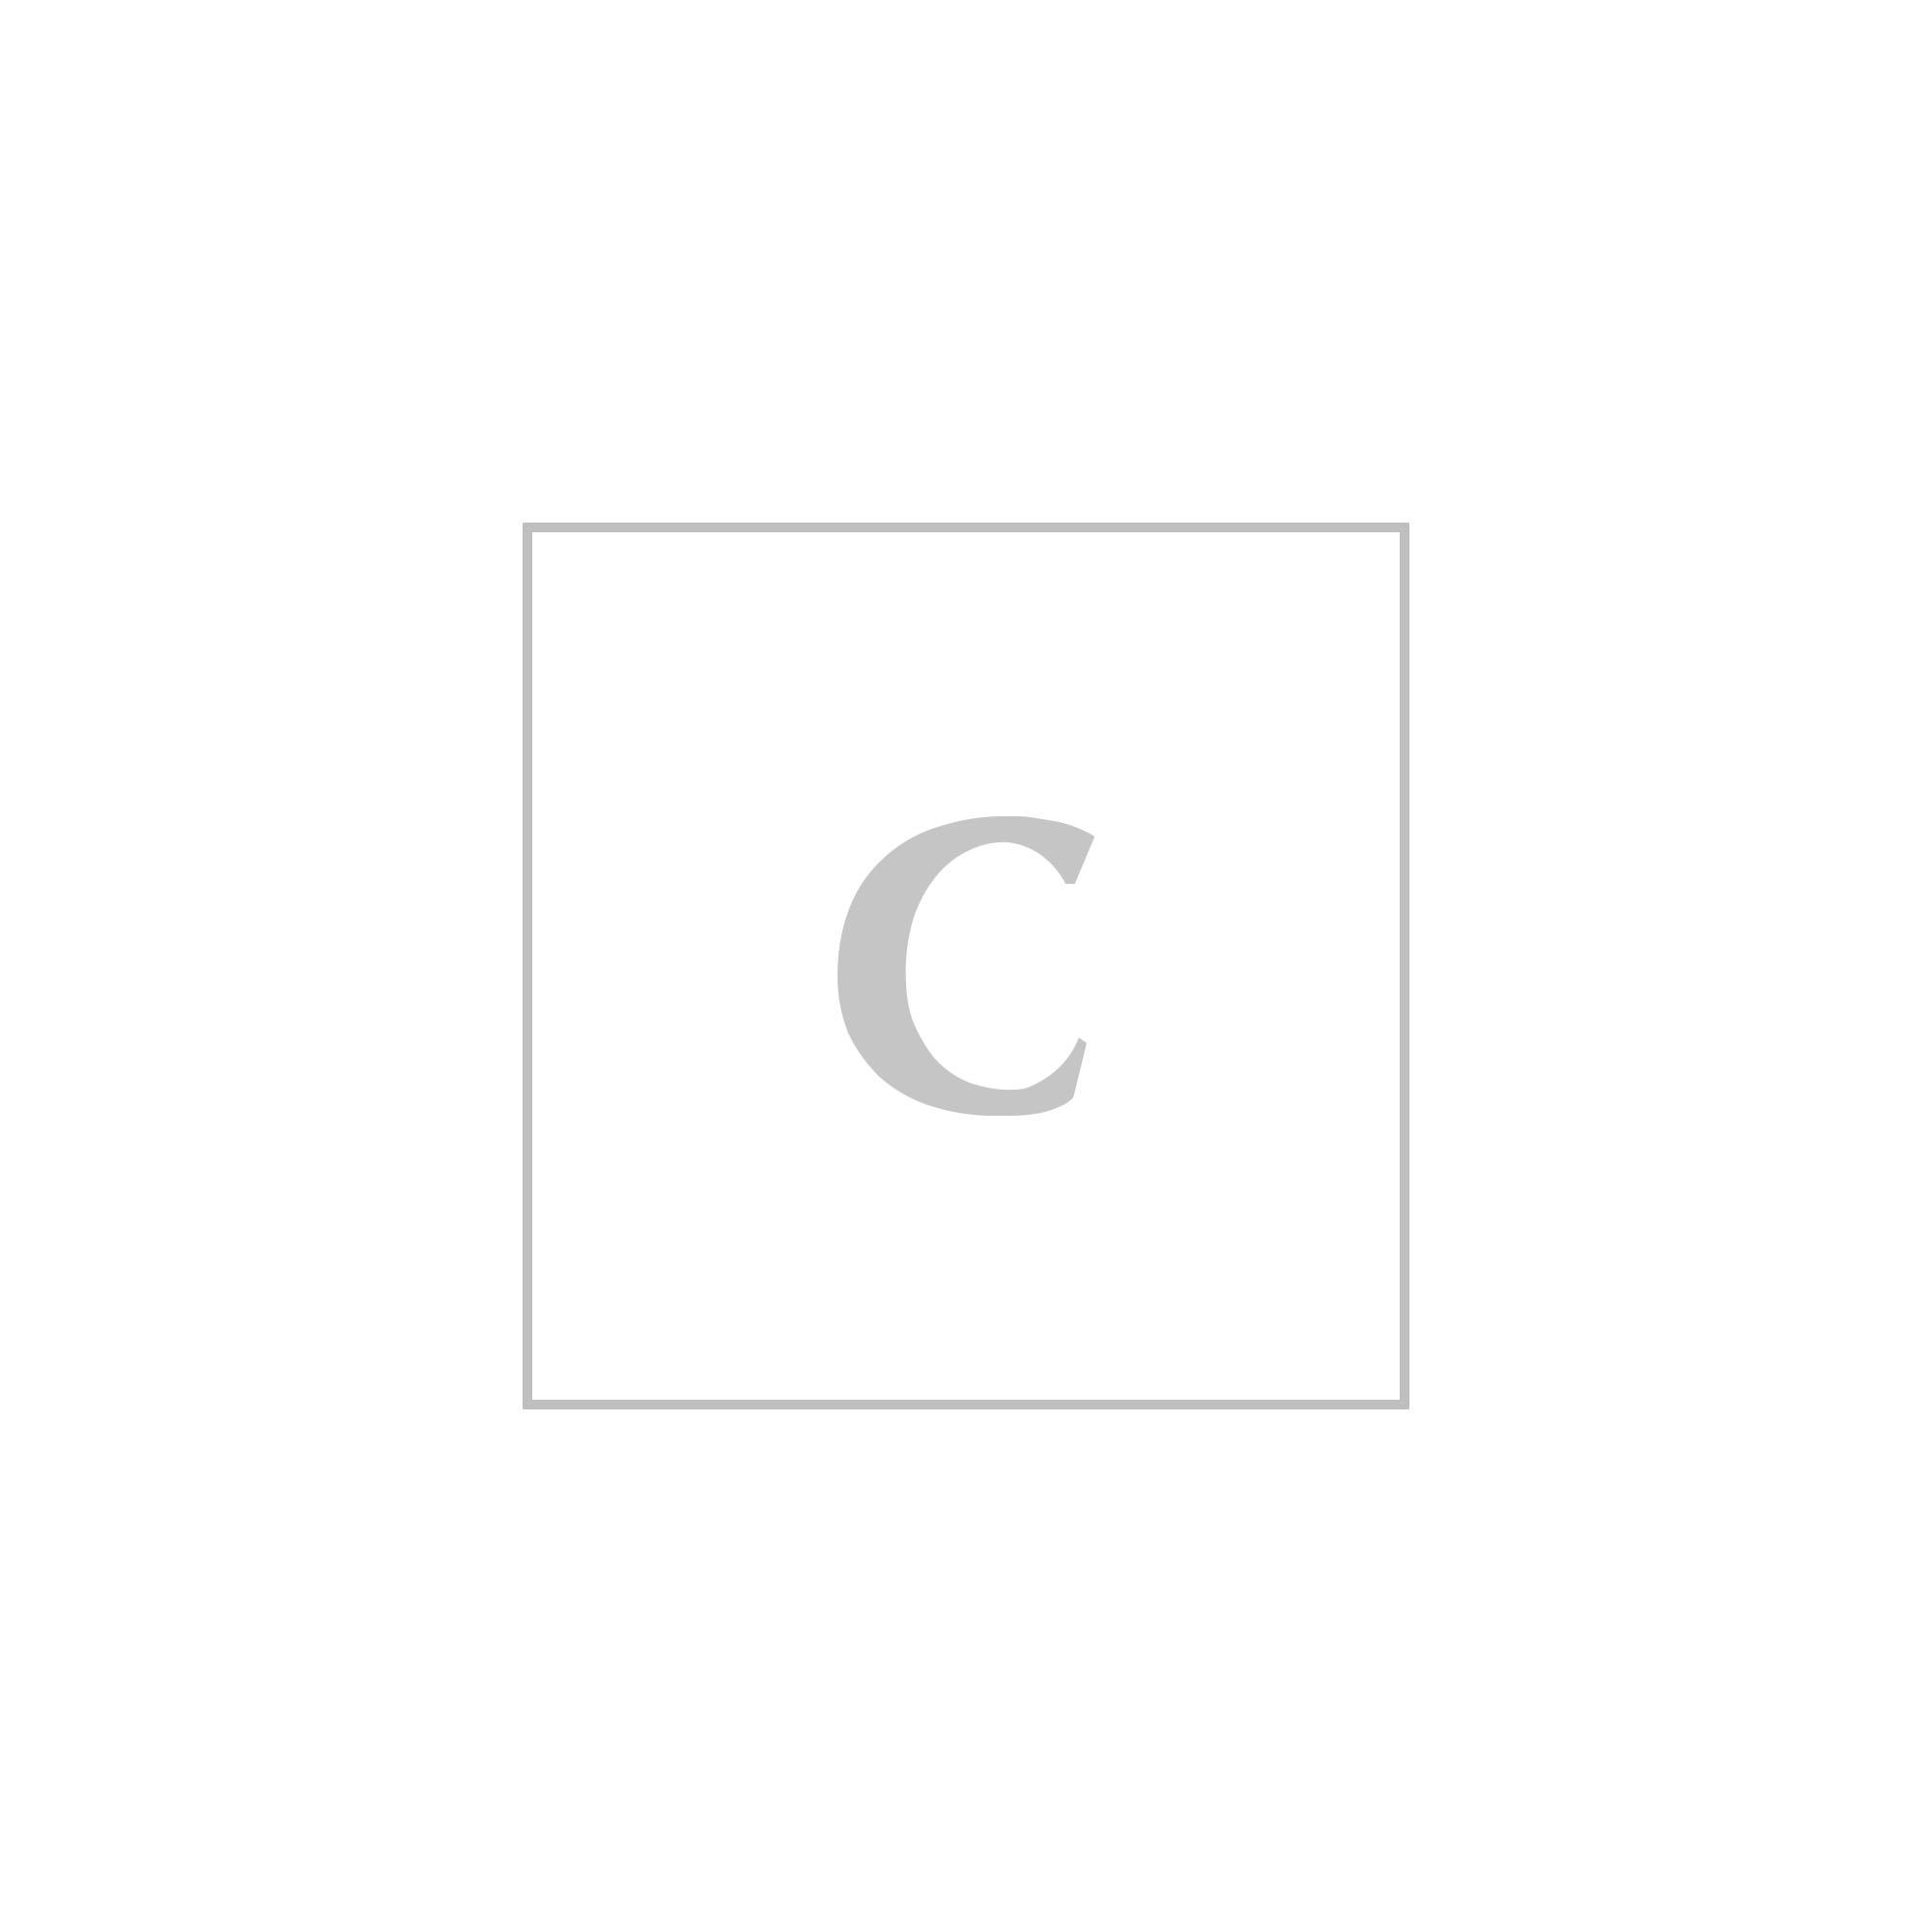 Charlotte olympia carla pumps